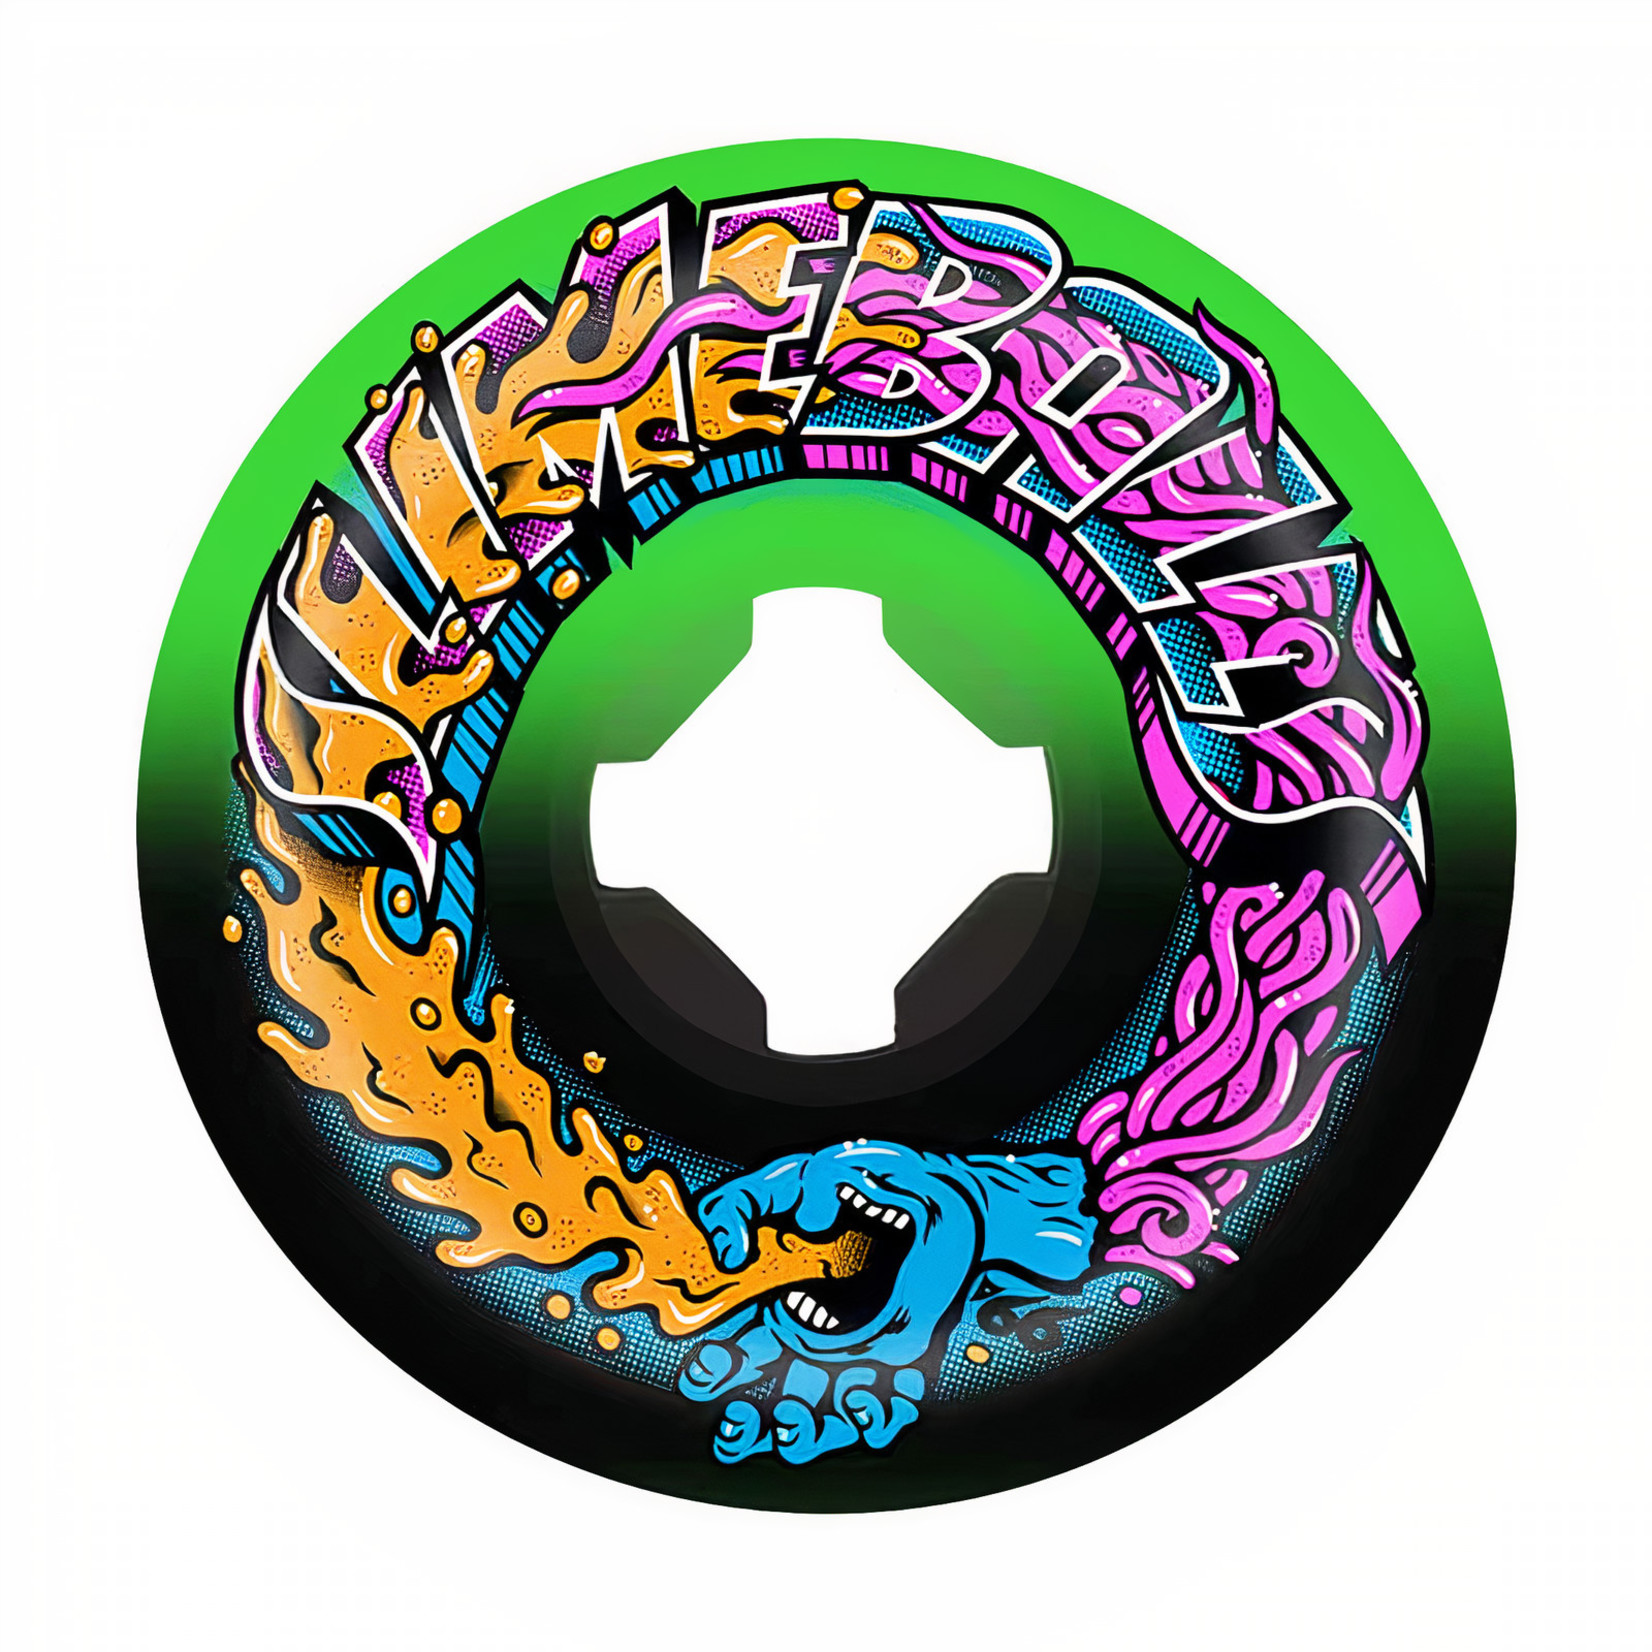 Slime Balls Slime Balls - Wheels - 99a Greetings Speed Balls Green / Black 56mm